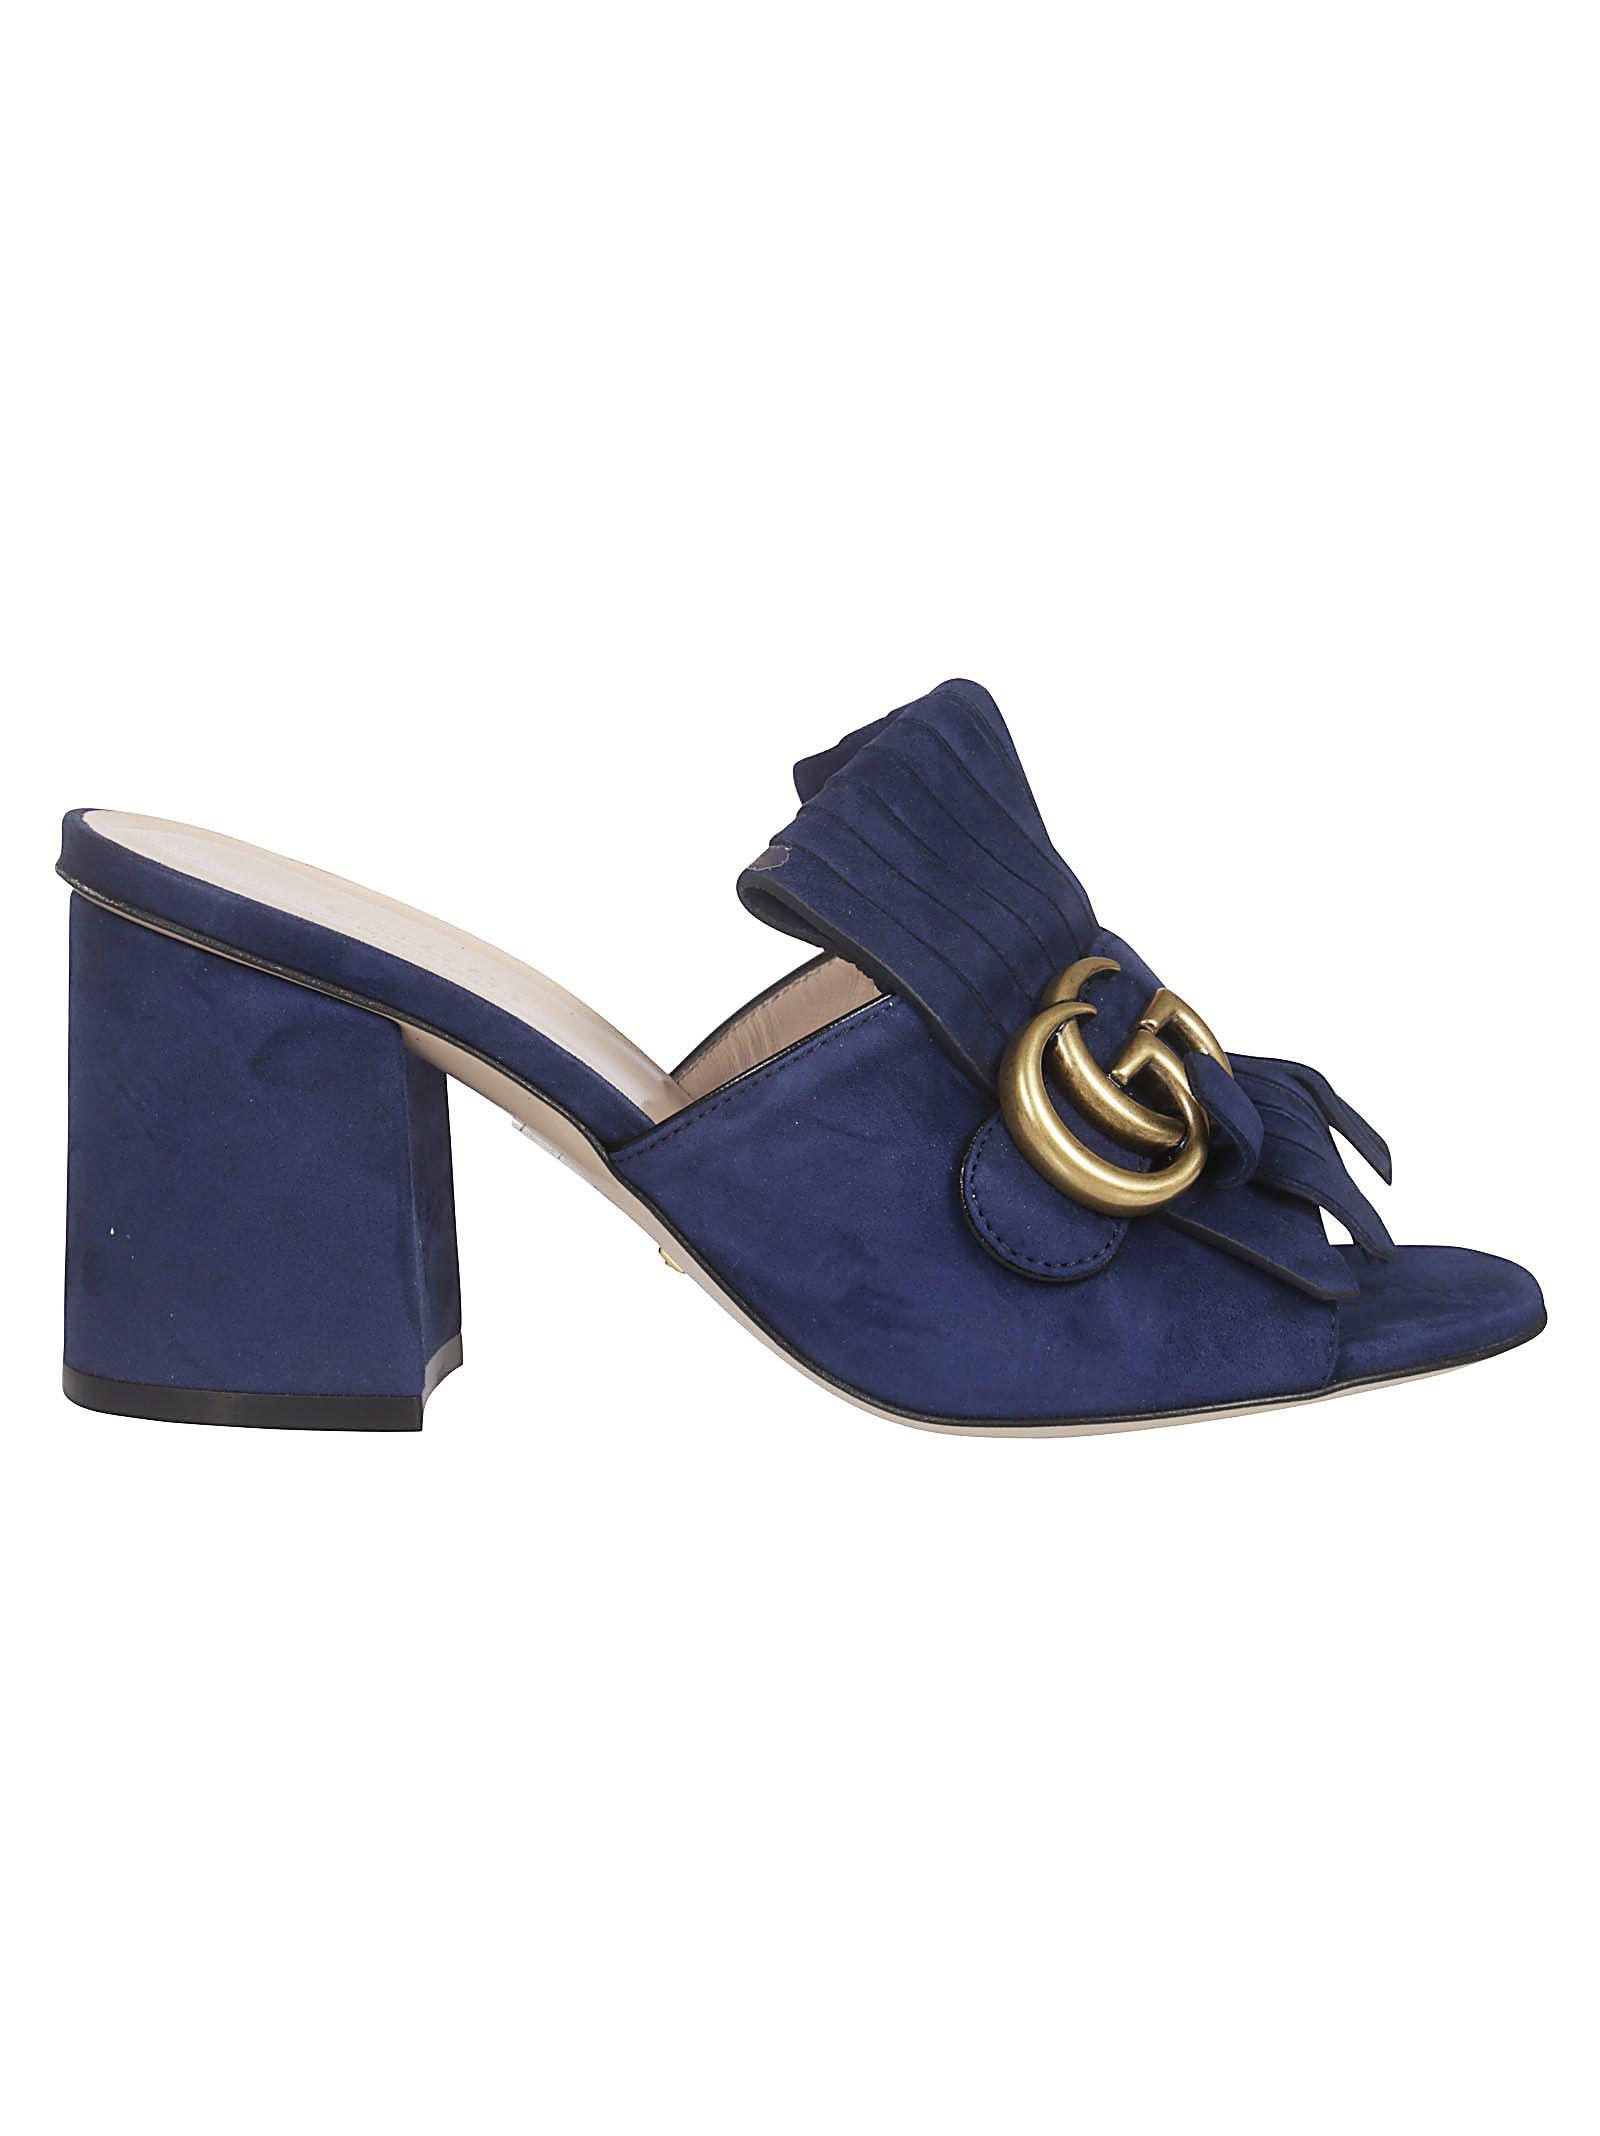 Gucci Double G Sandals